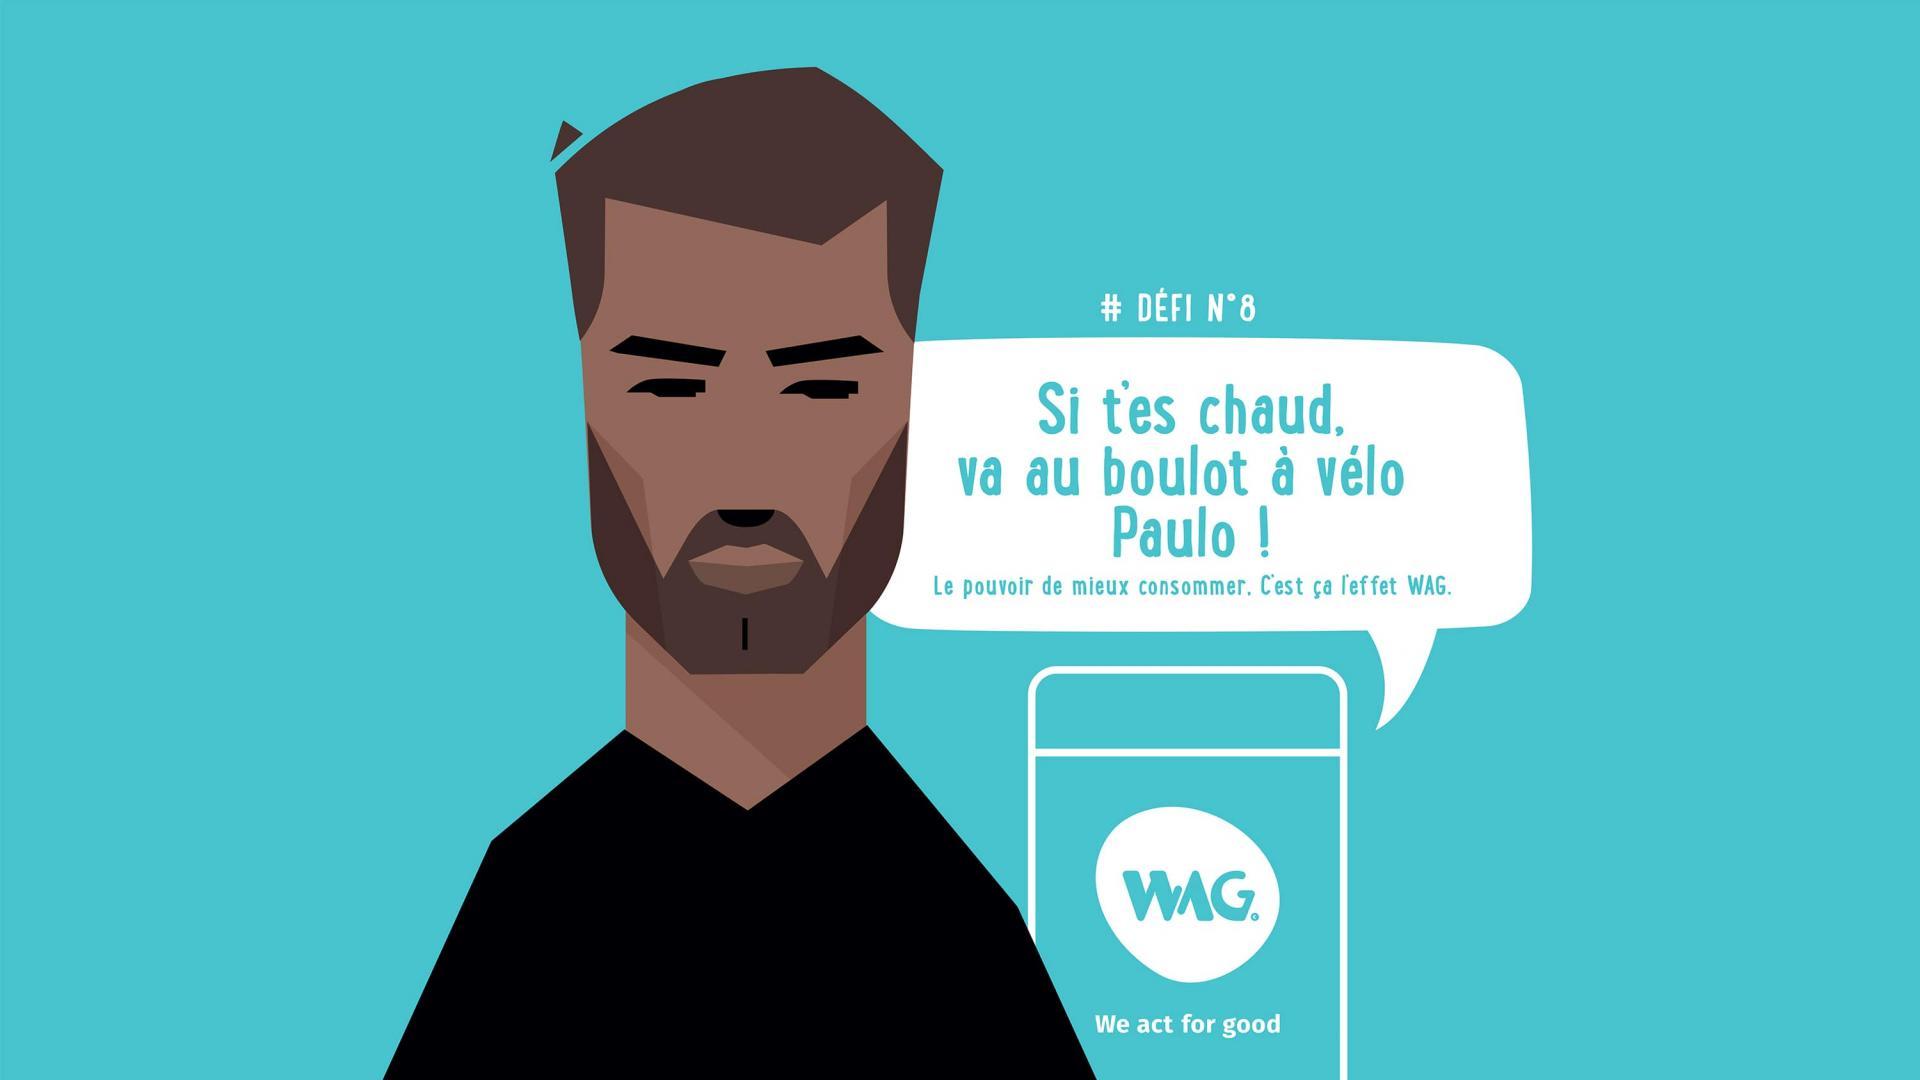 WAG wwf présentation